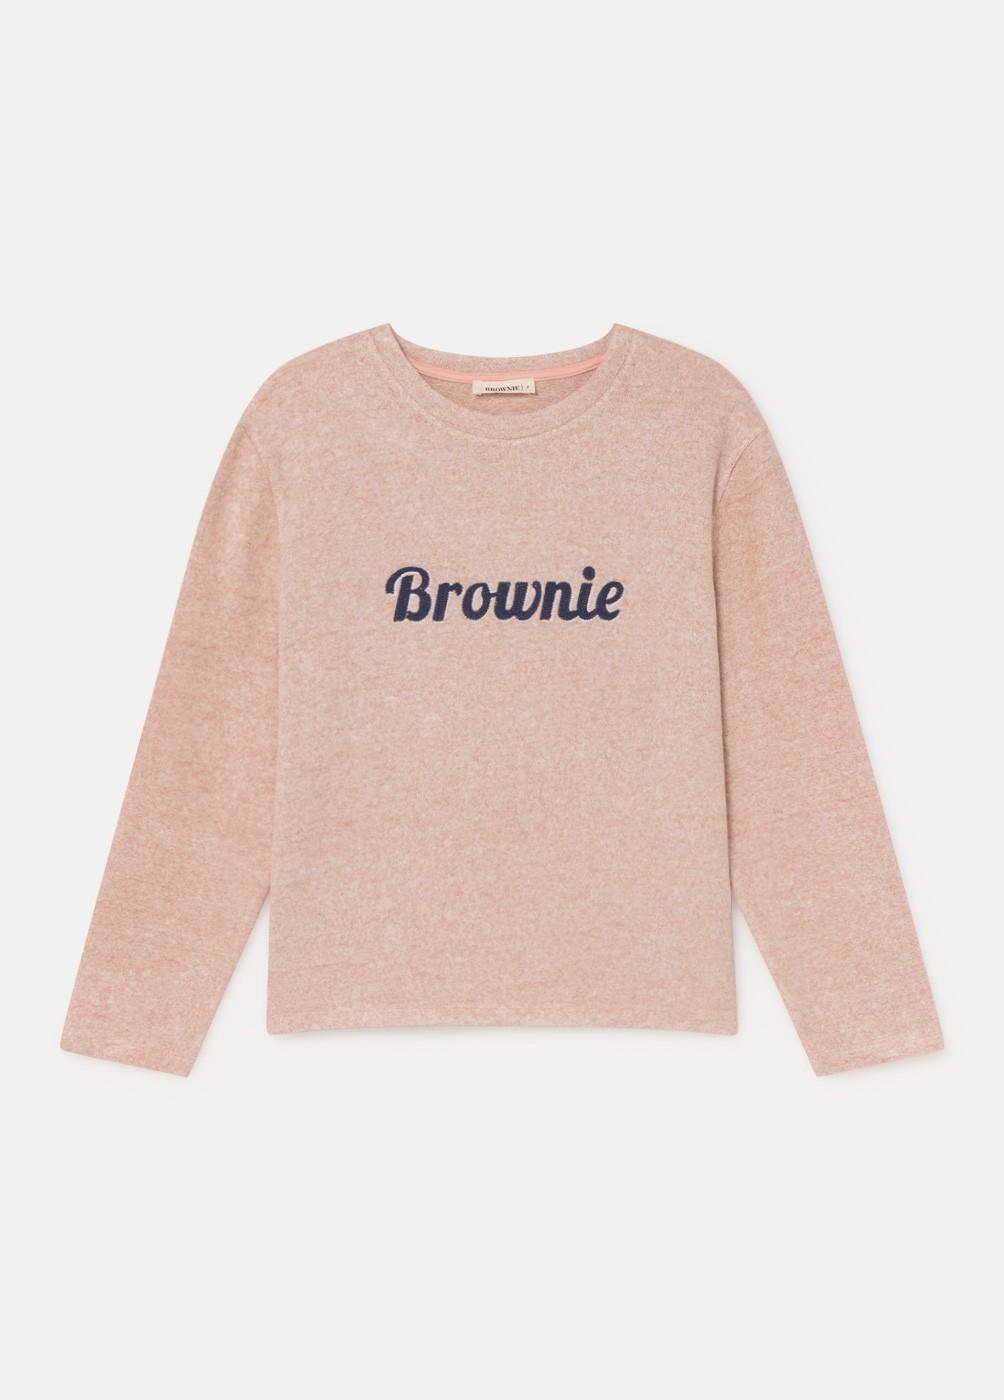 BROWNIE LOGO T-SHIRT